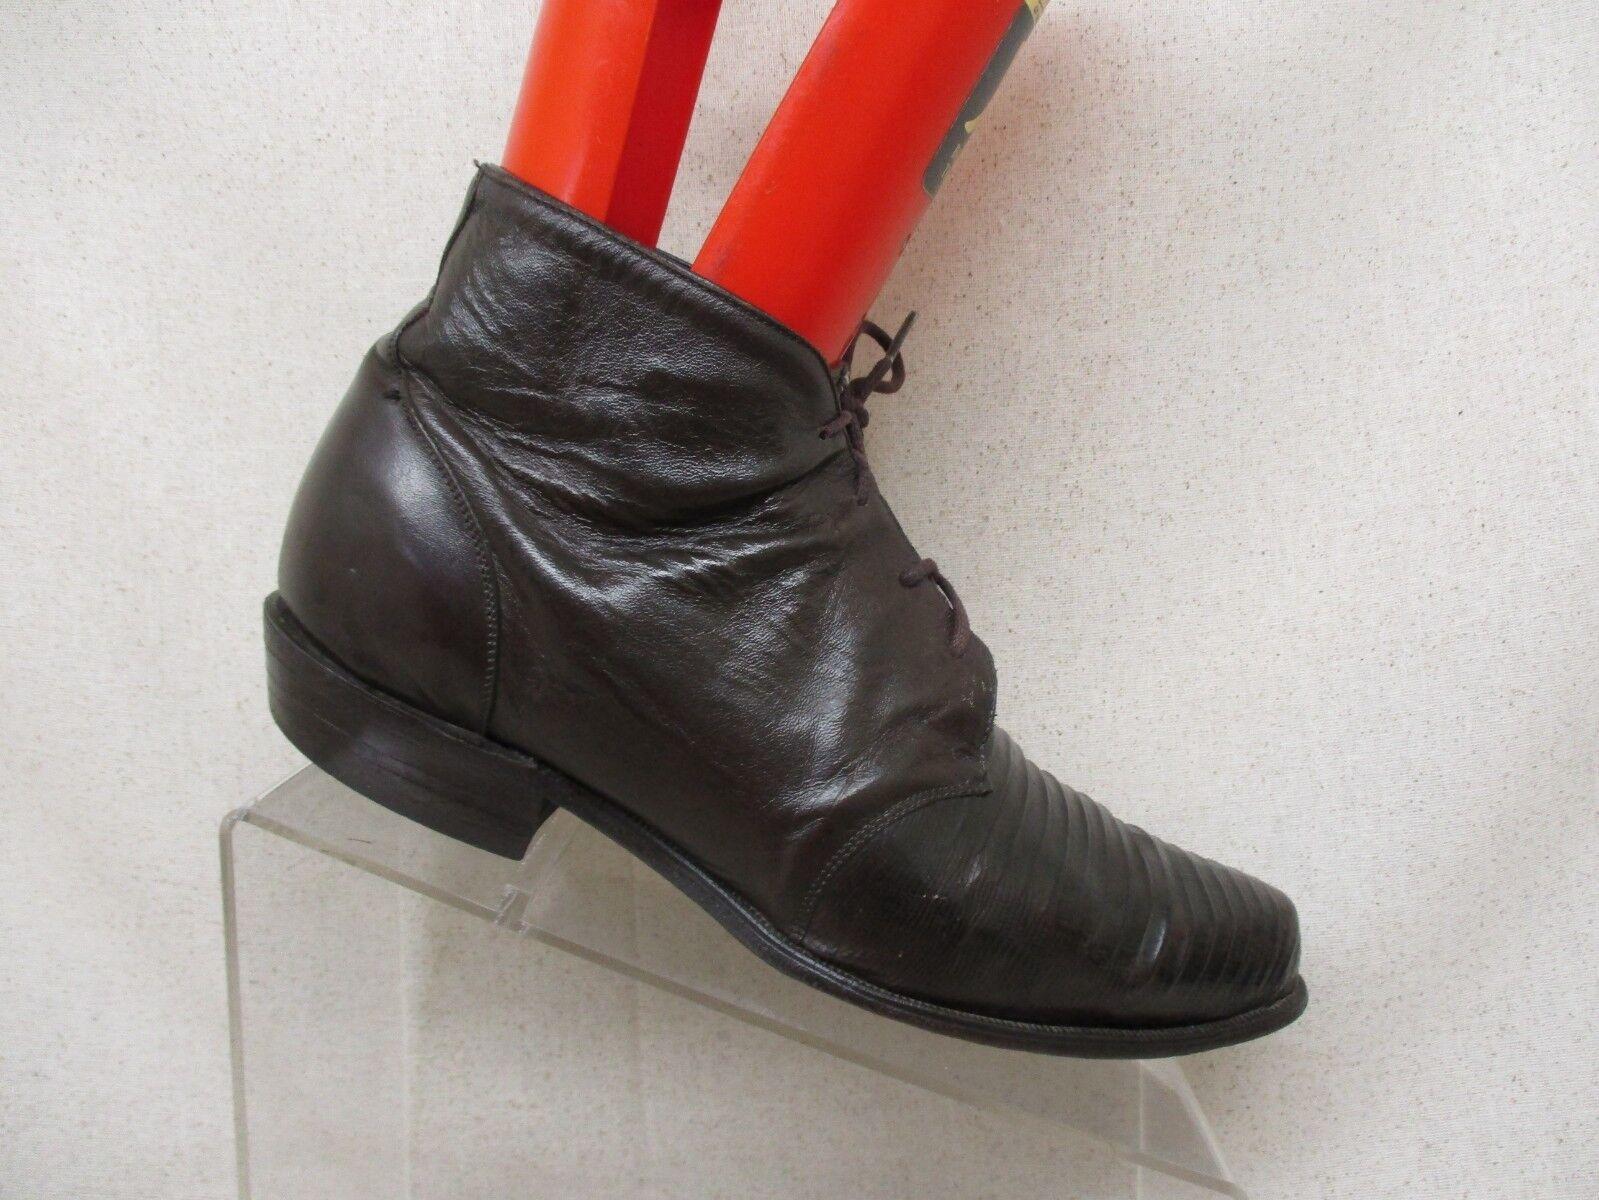 TONY LAMA braun Leather Lizard Skin Lace Up Ankle Ankle Ankle Fashion Stiefel Größe 8.5 M ef638d